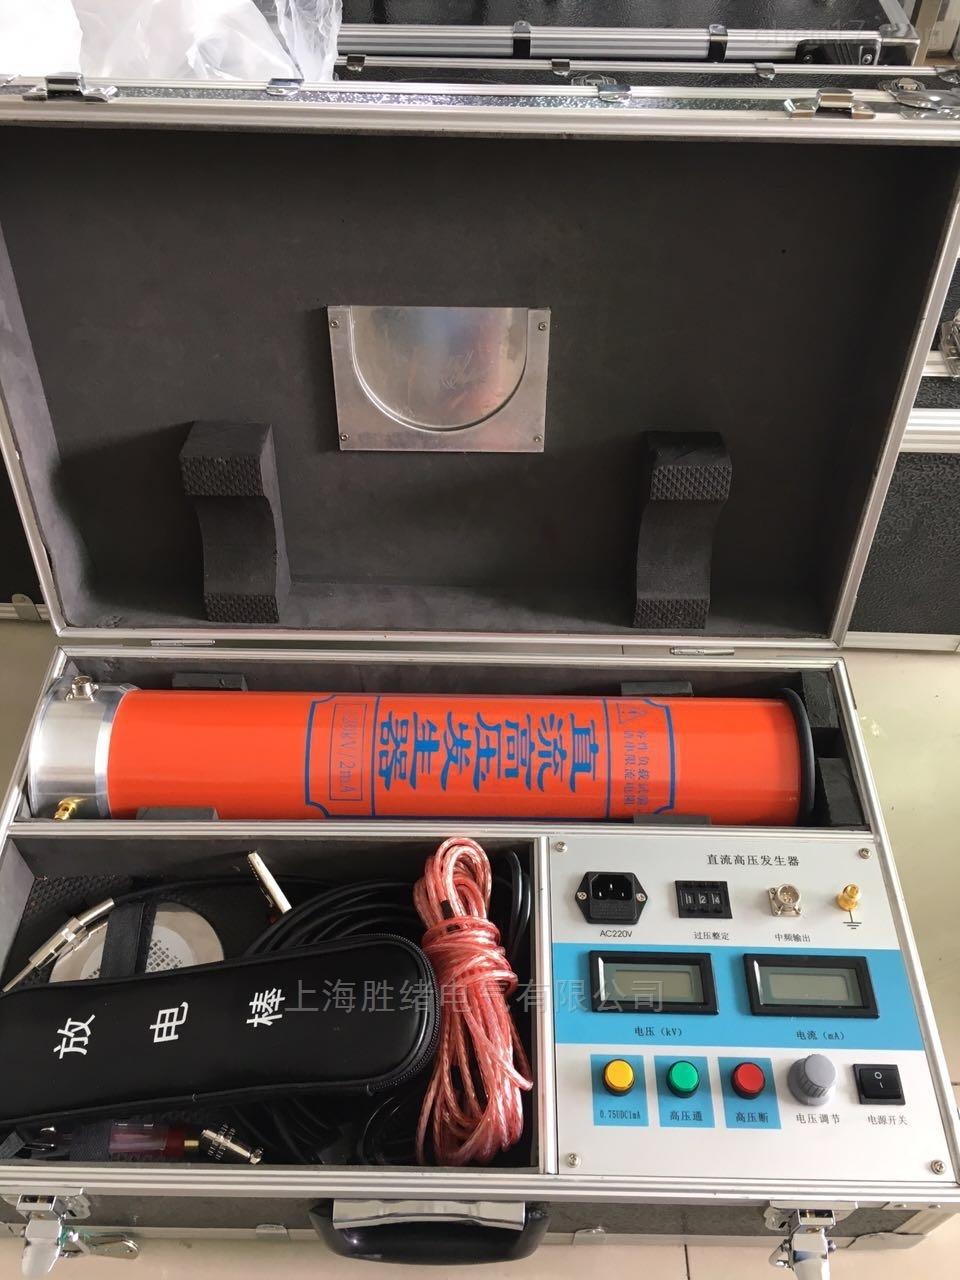 YHZF-60-2便携式直流高压发生器